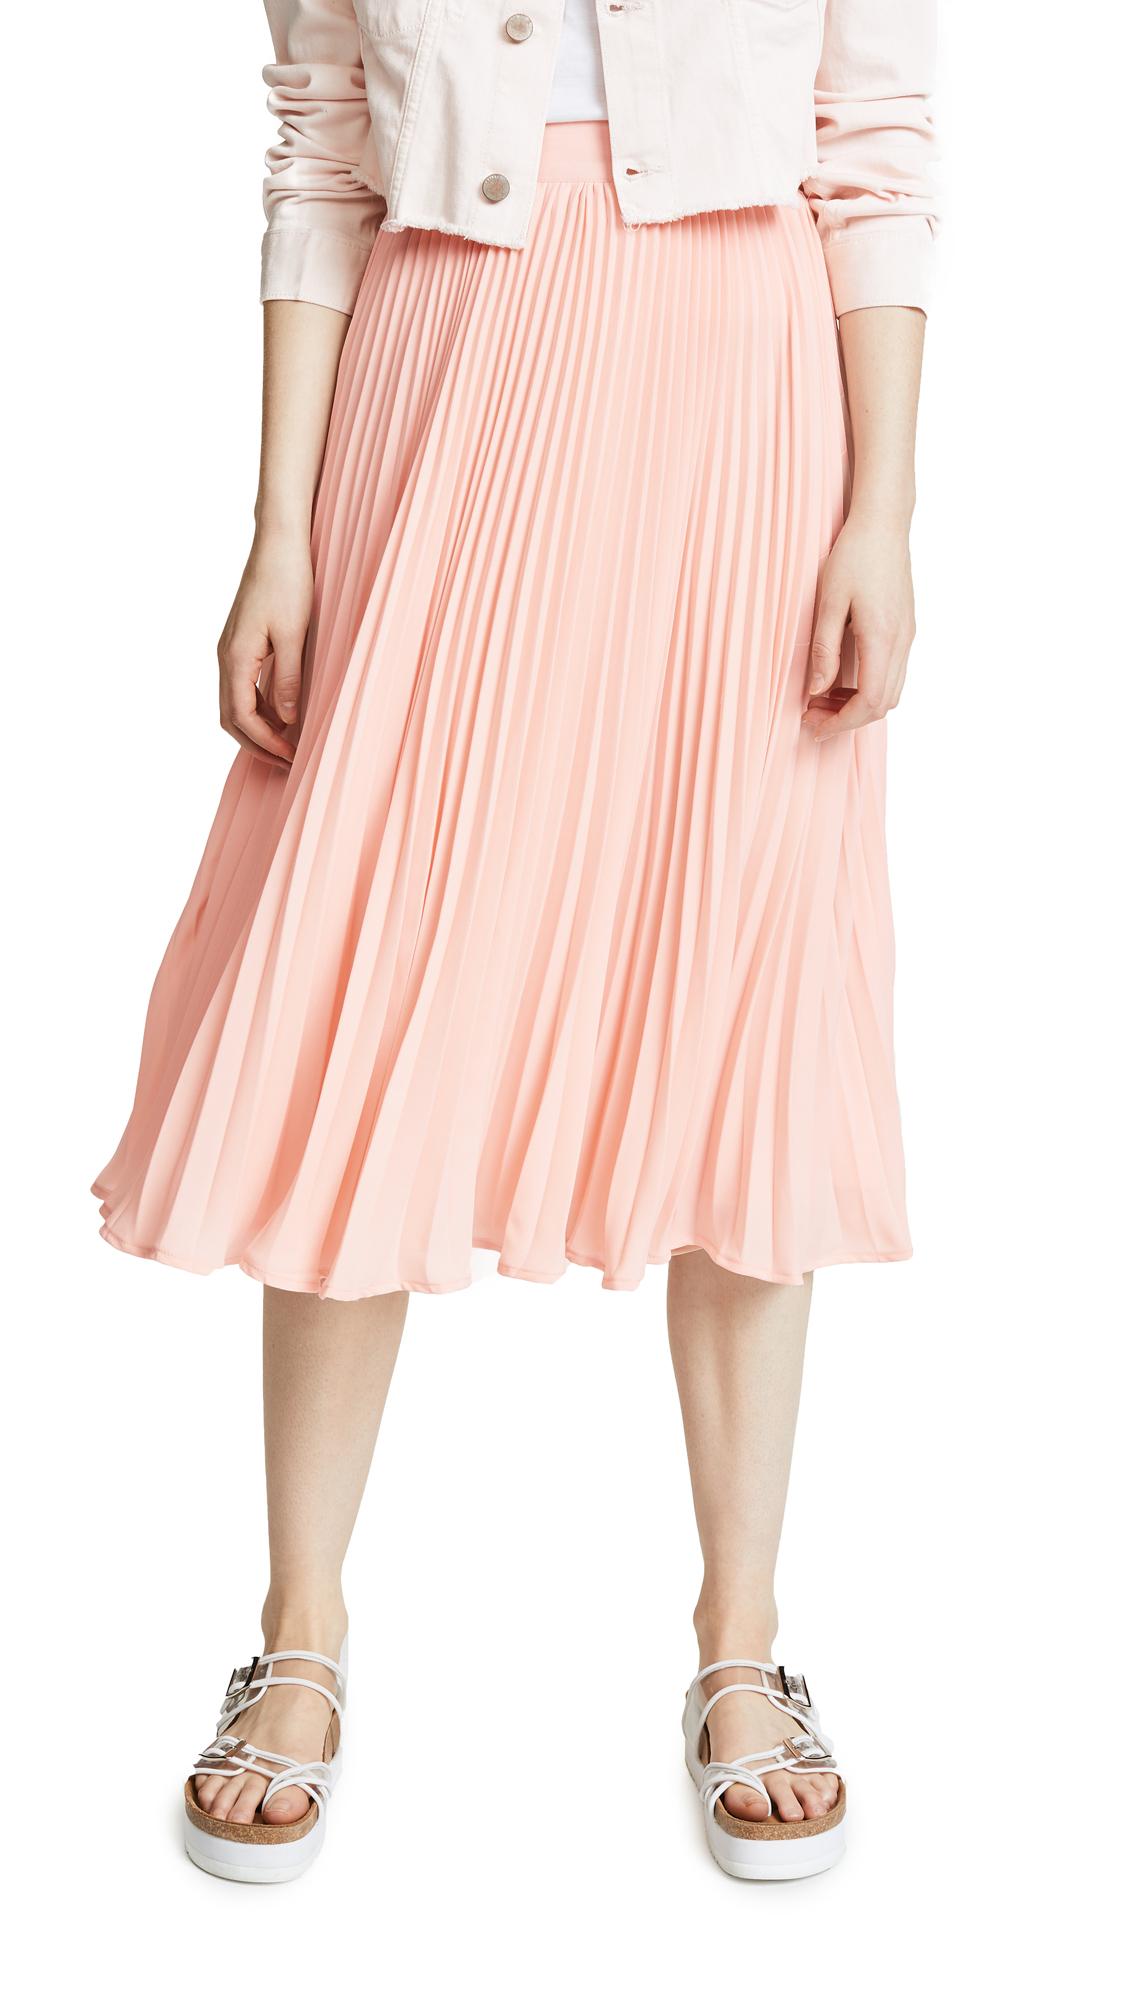 ENGLISH FACTORY Long Pleated Skirt - Khaki Rose